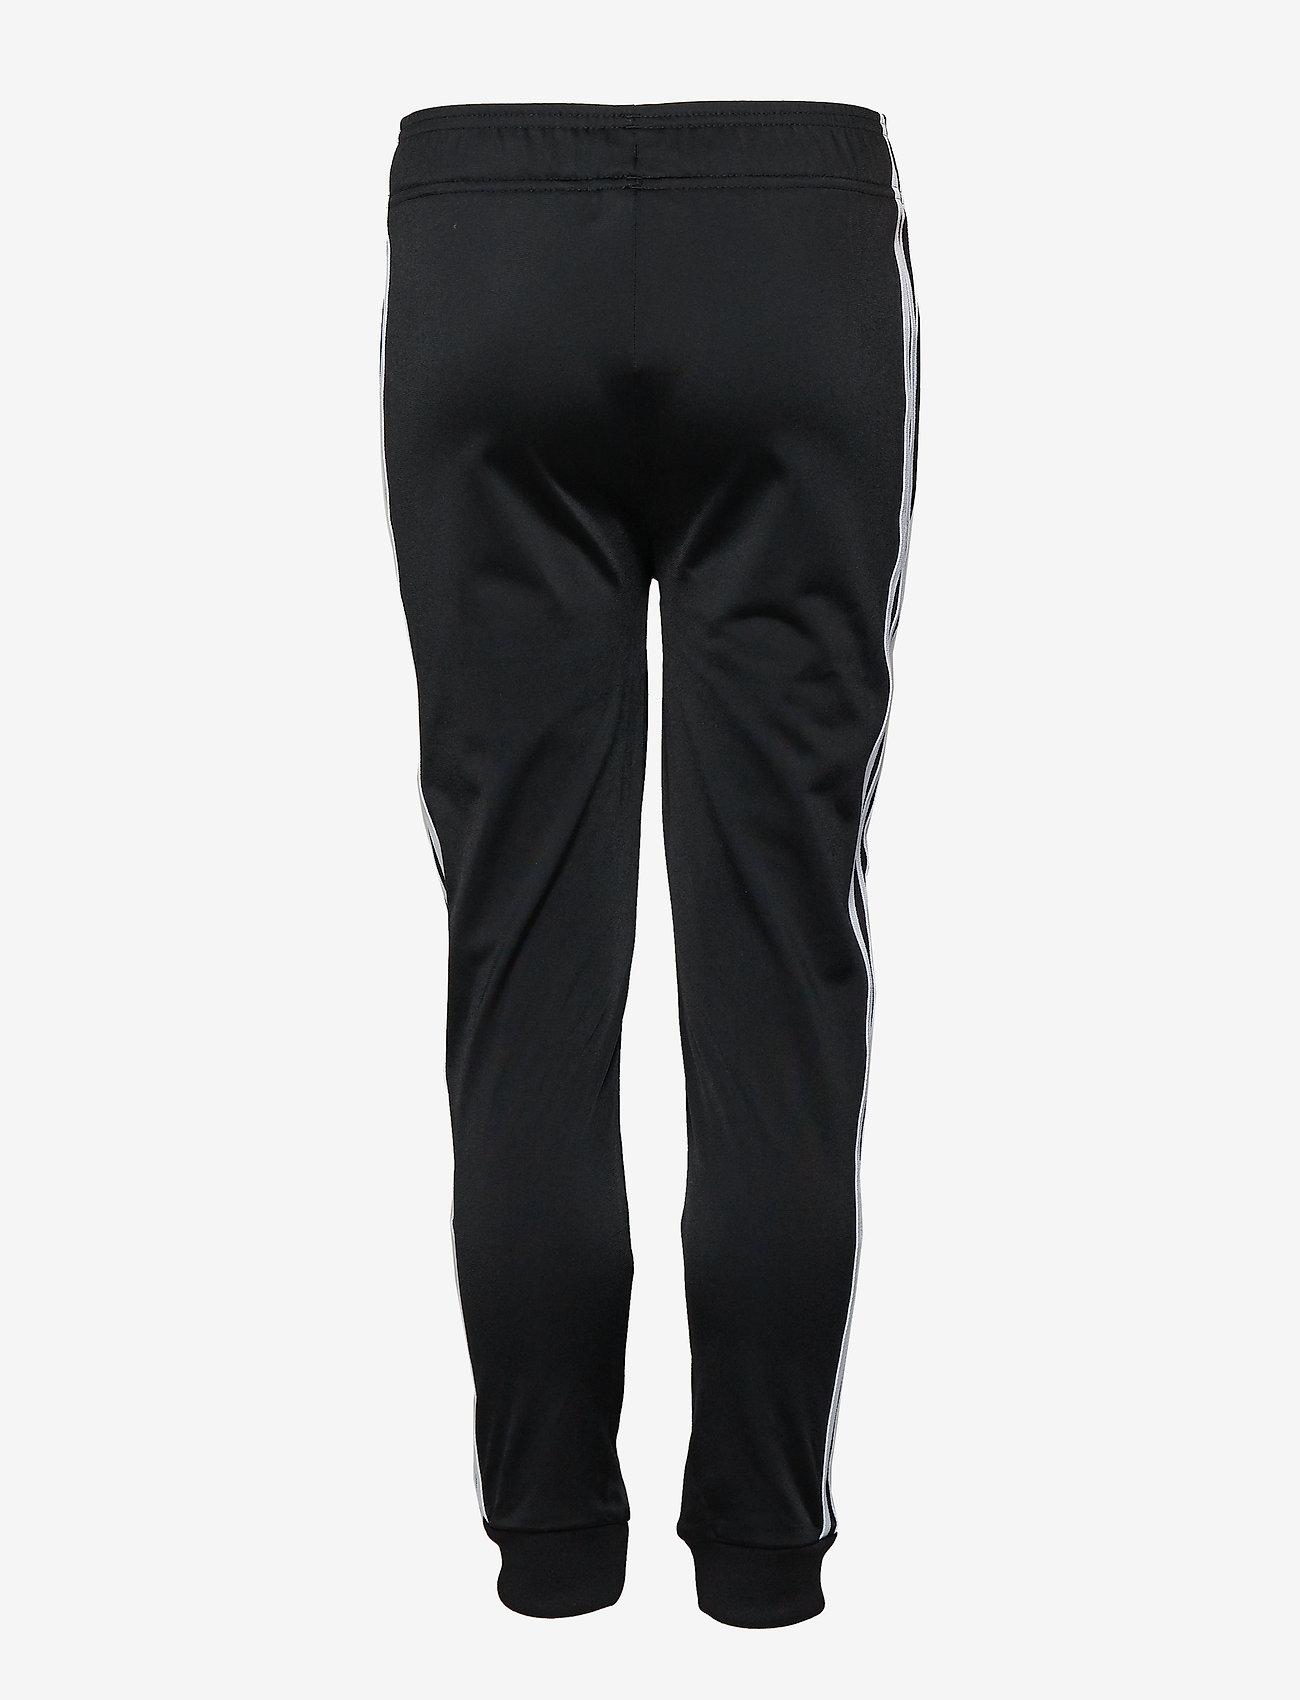 Adidas Originals Superstar Pants - Nederdelar Black/white